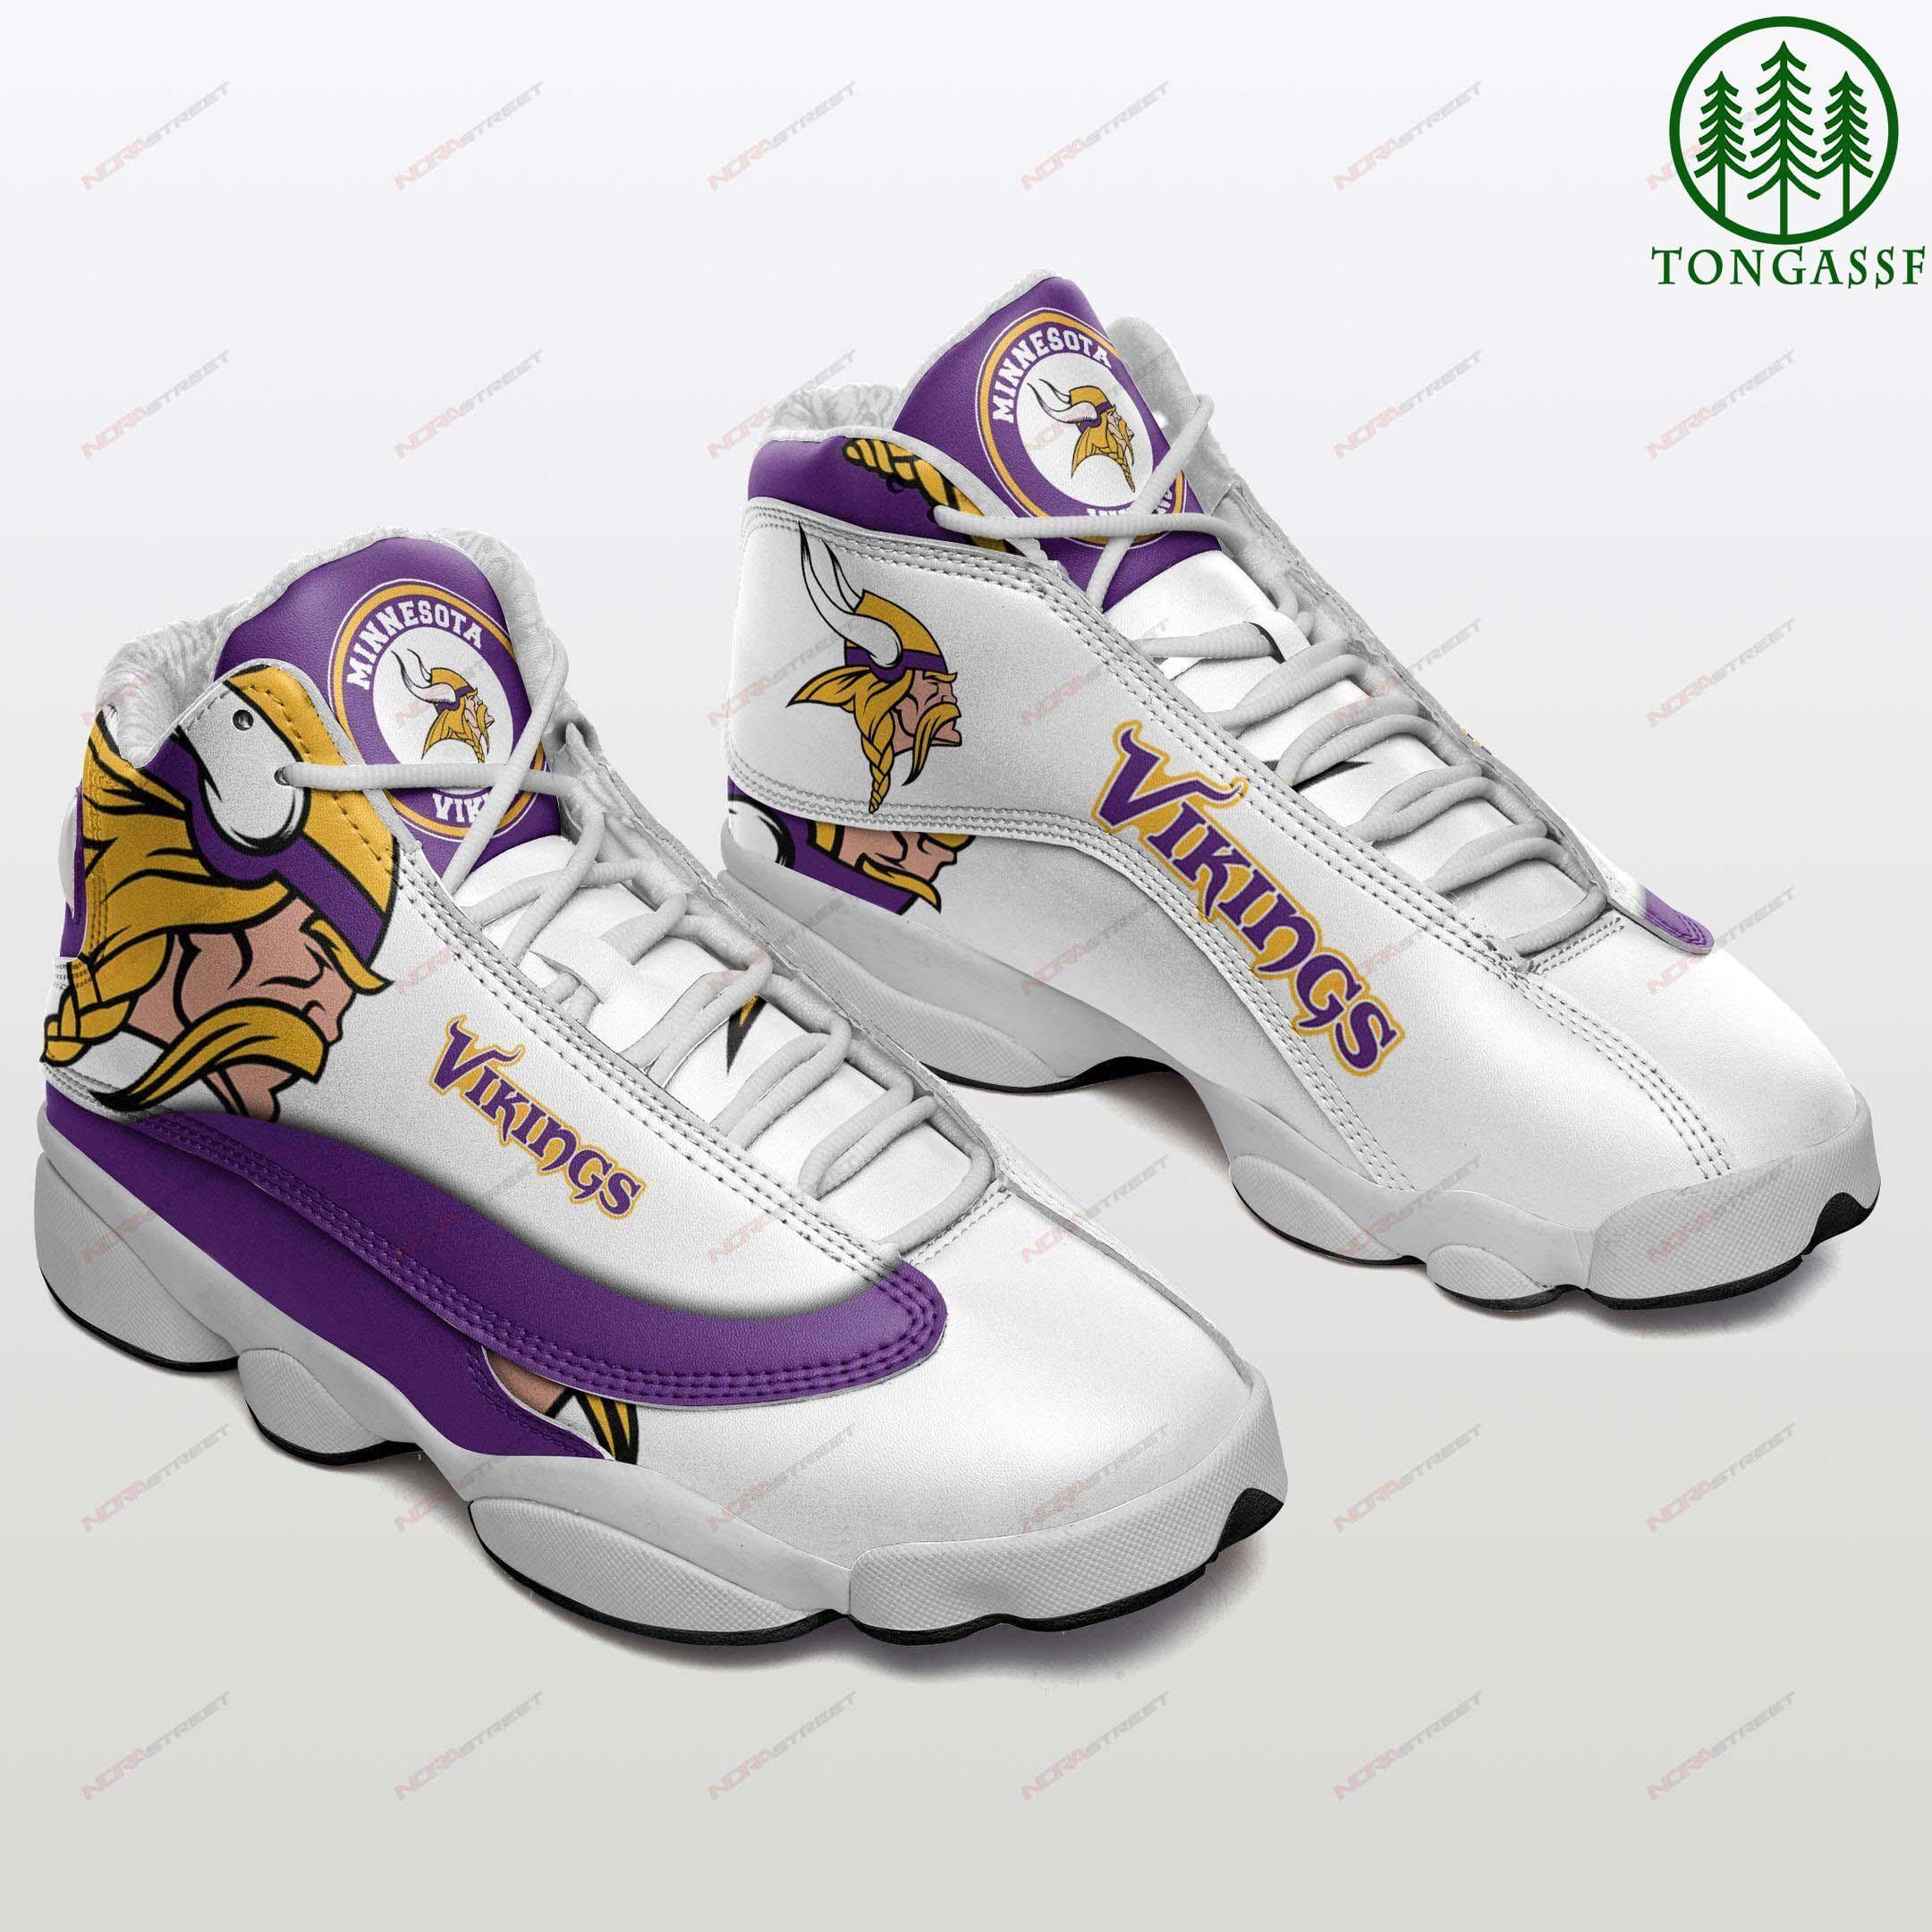 Minnesota Vikings Air Jordan 13 Sneakers Sport Shoes